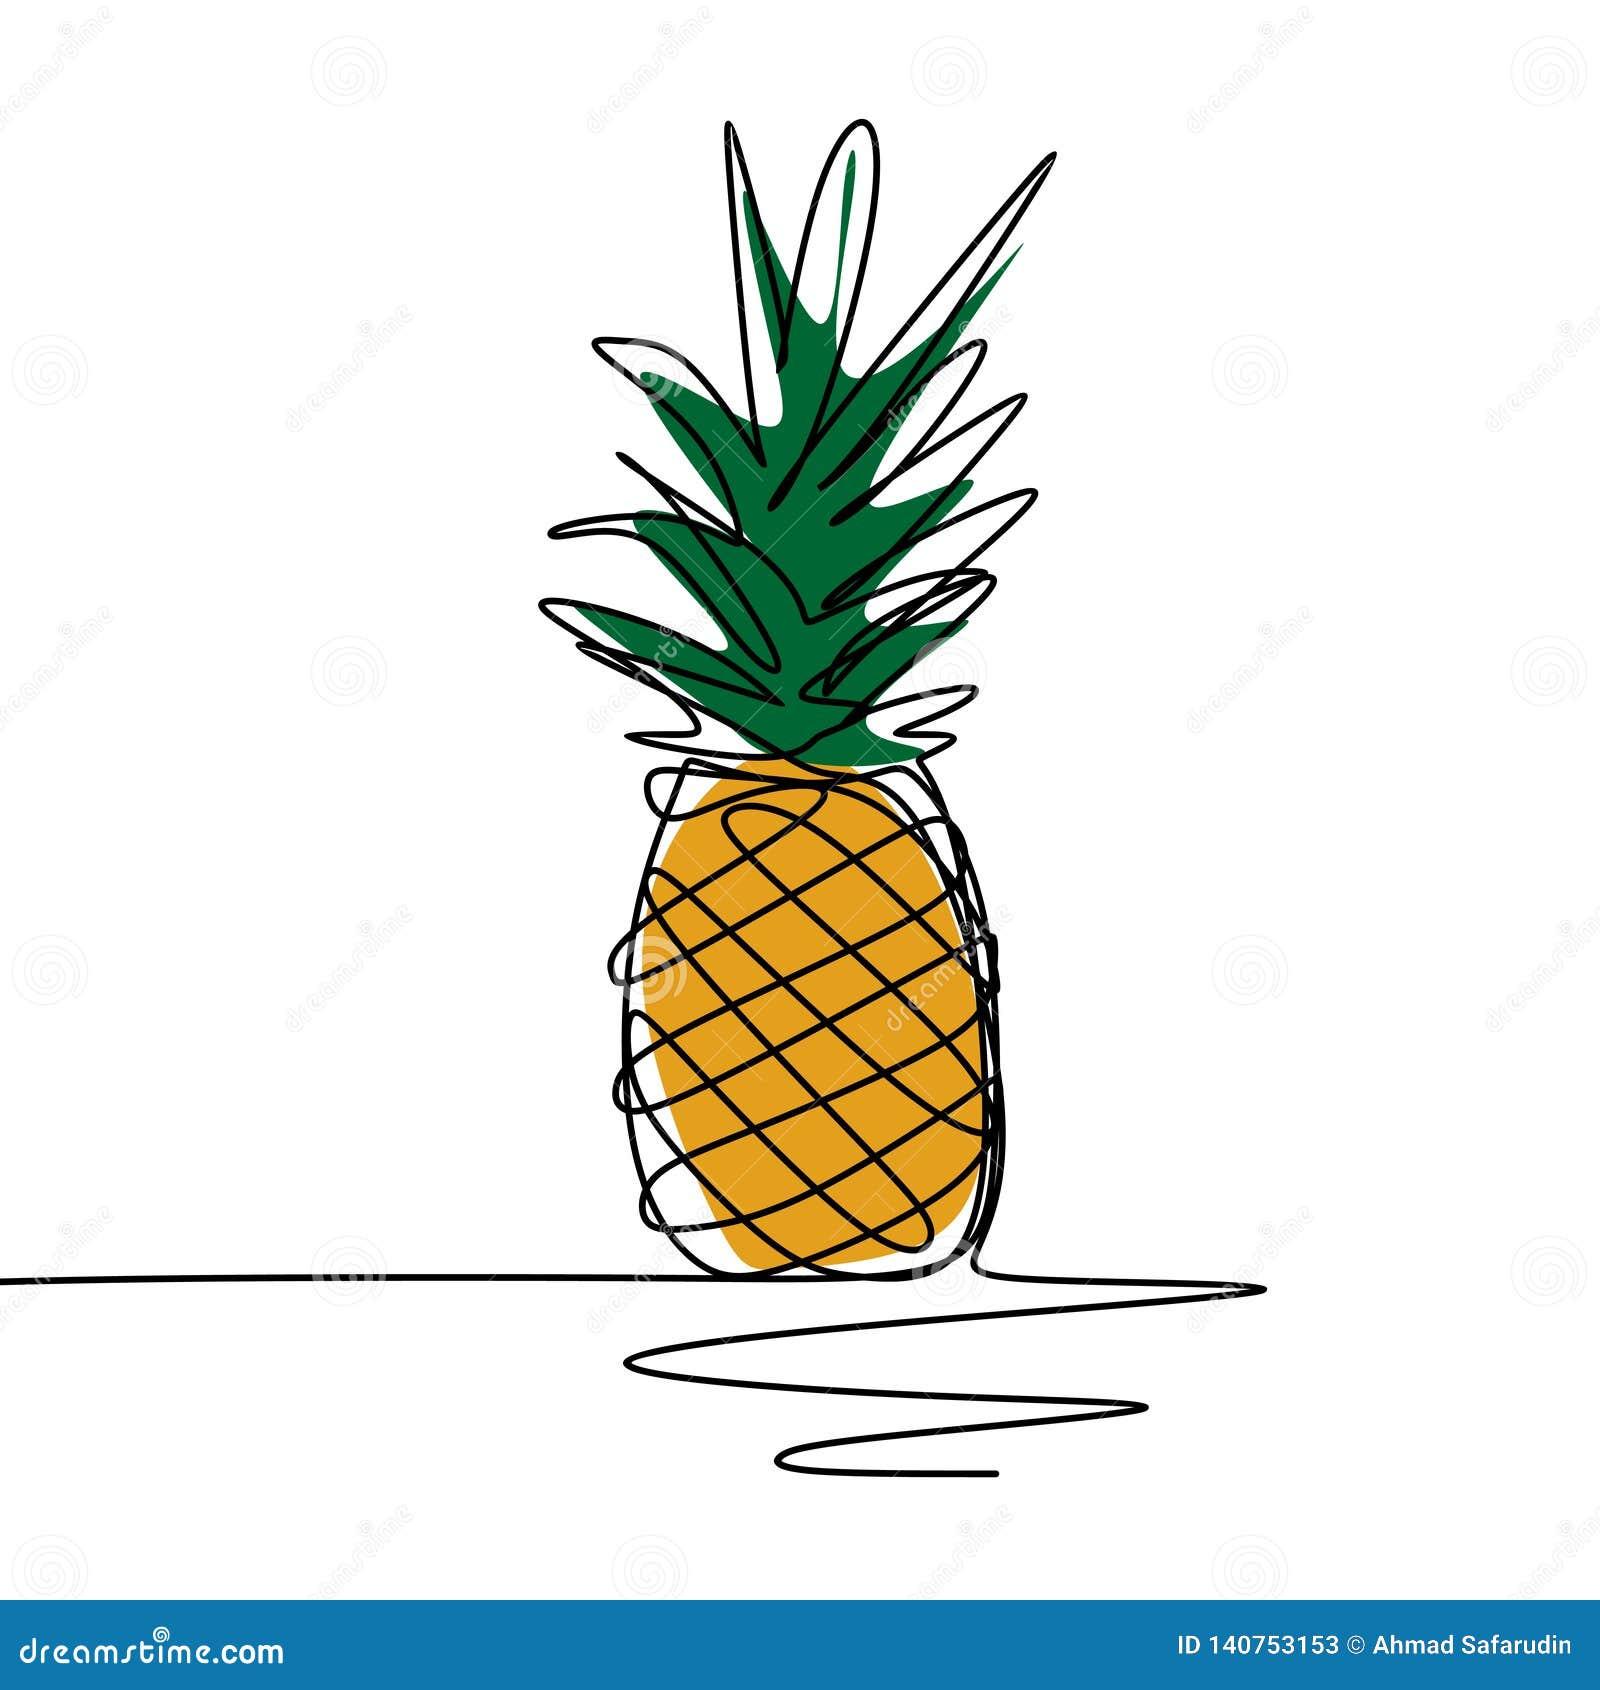 Continu Conception Minimaliste Ananas Un Dillustration De